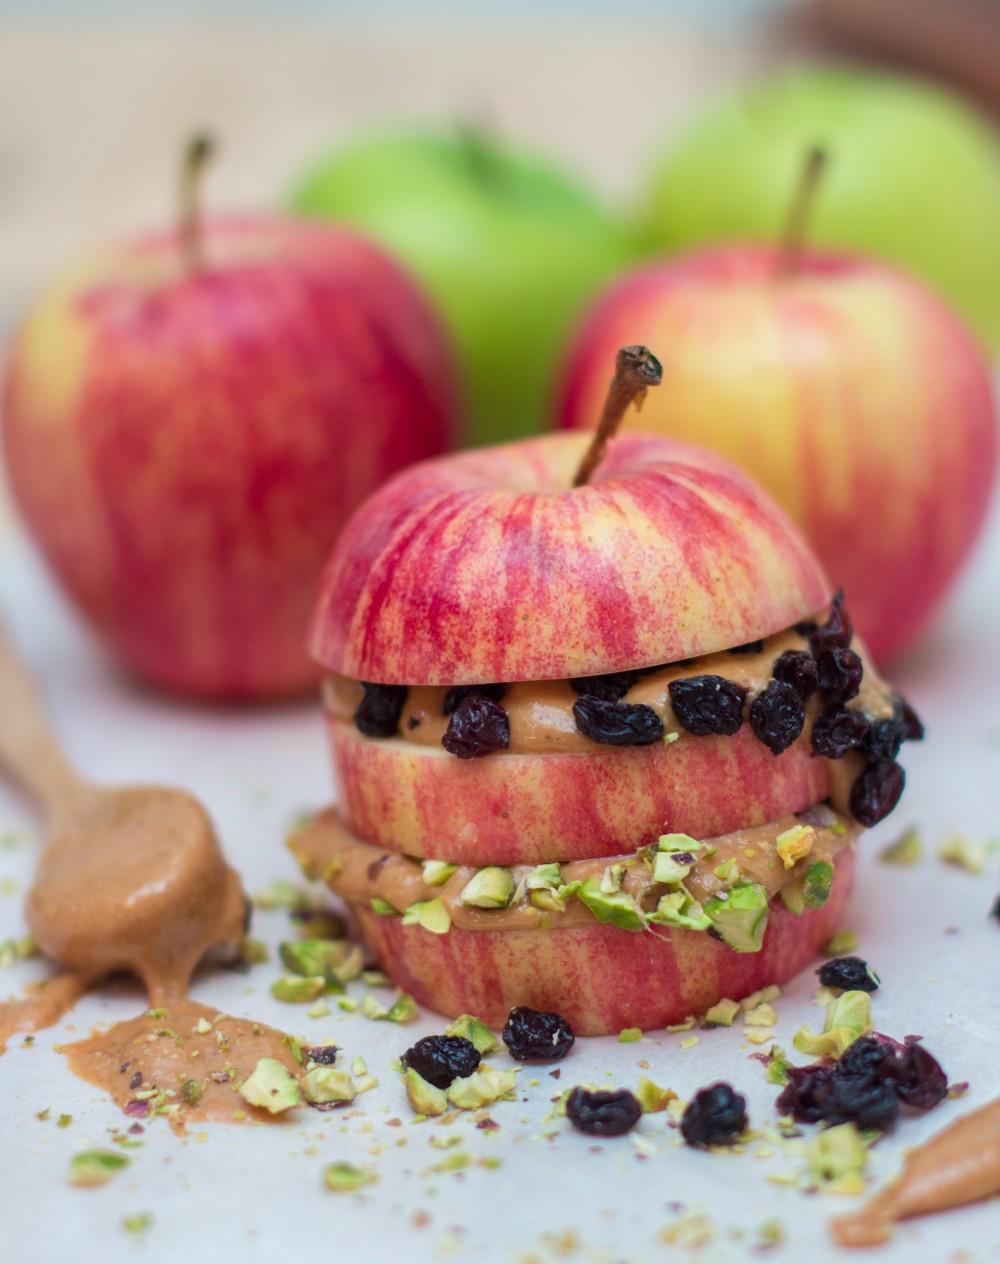 Apple Peanut Butter Sandwich - Jerry James Stone